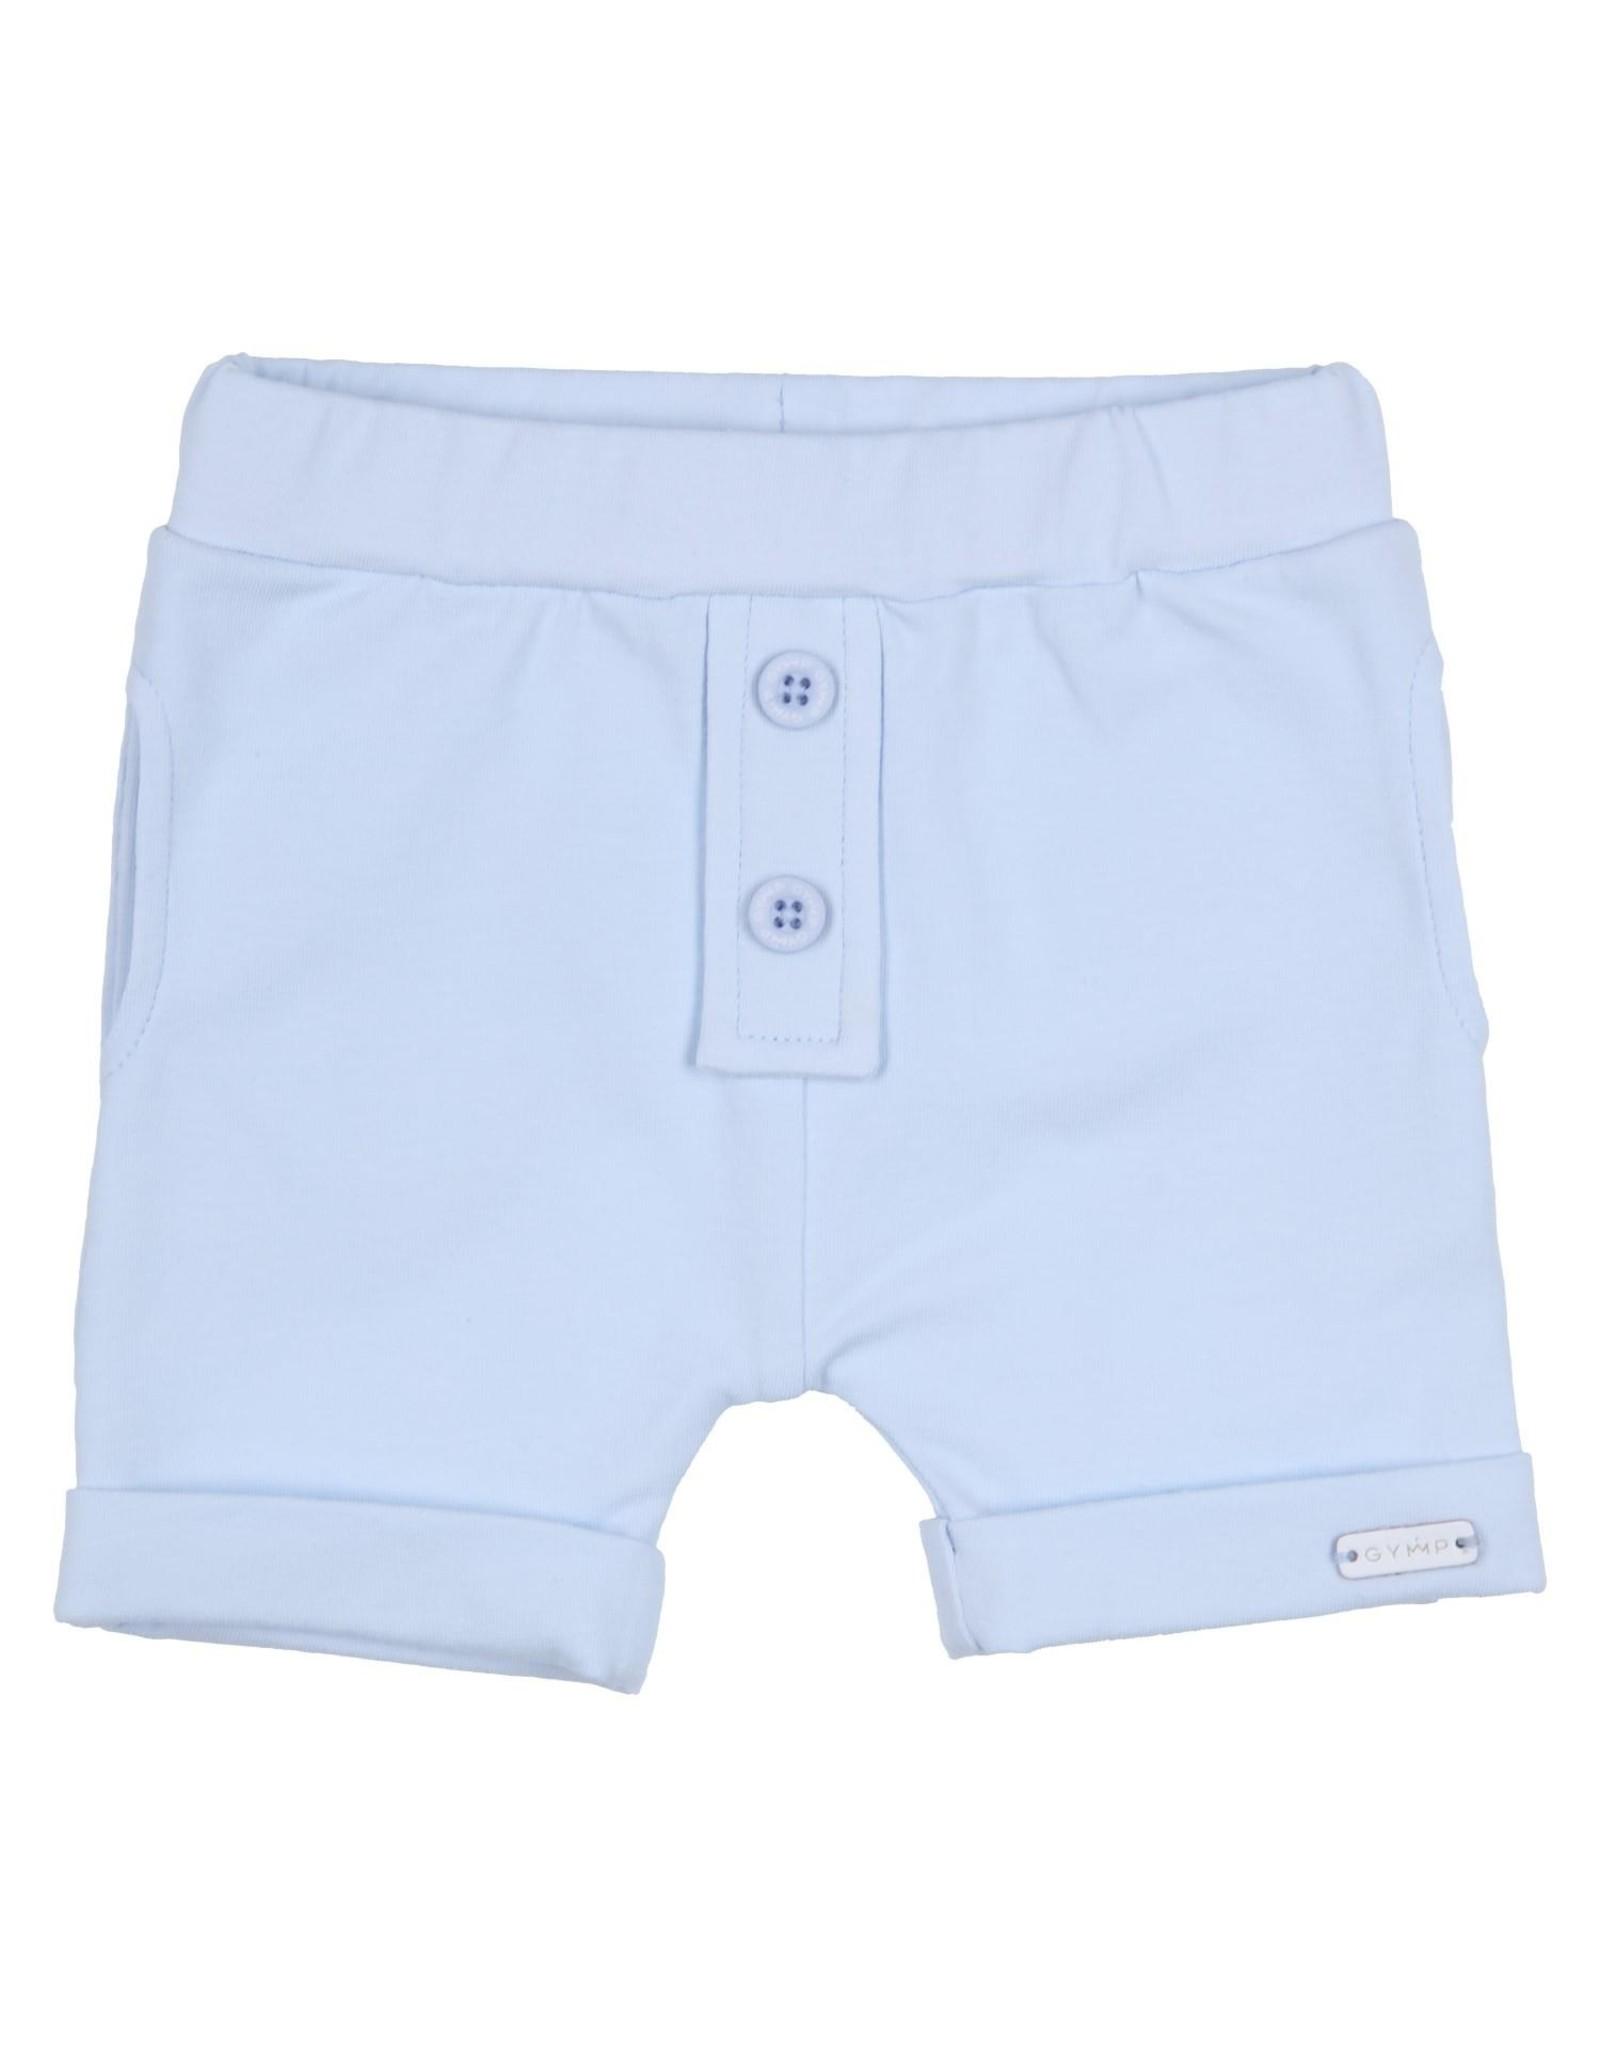 Gymp shorts - aeromax - baby&toddle lichtblauw